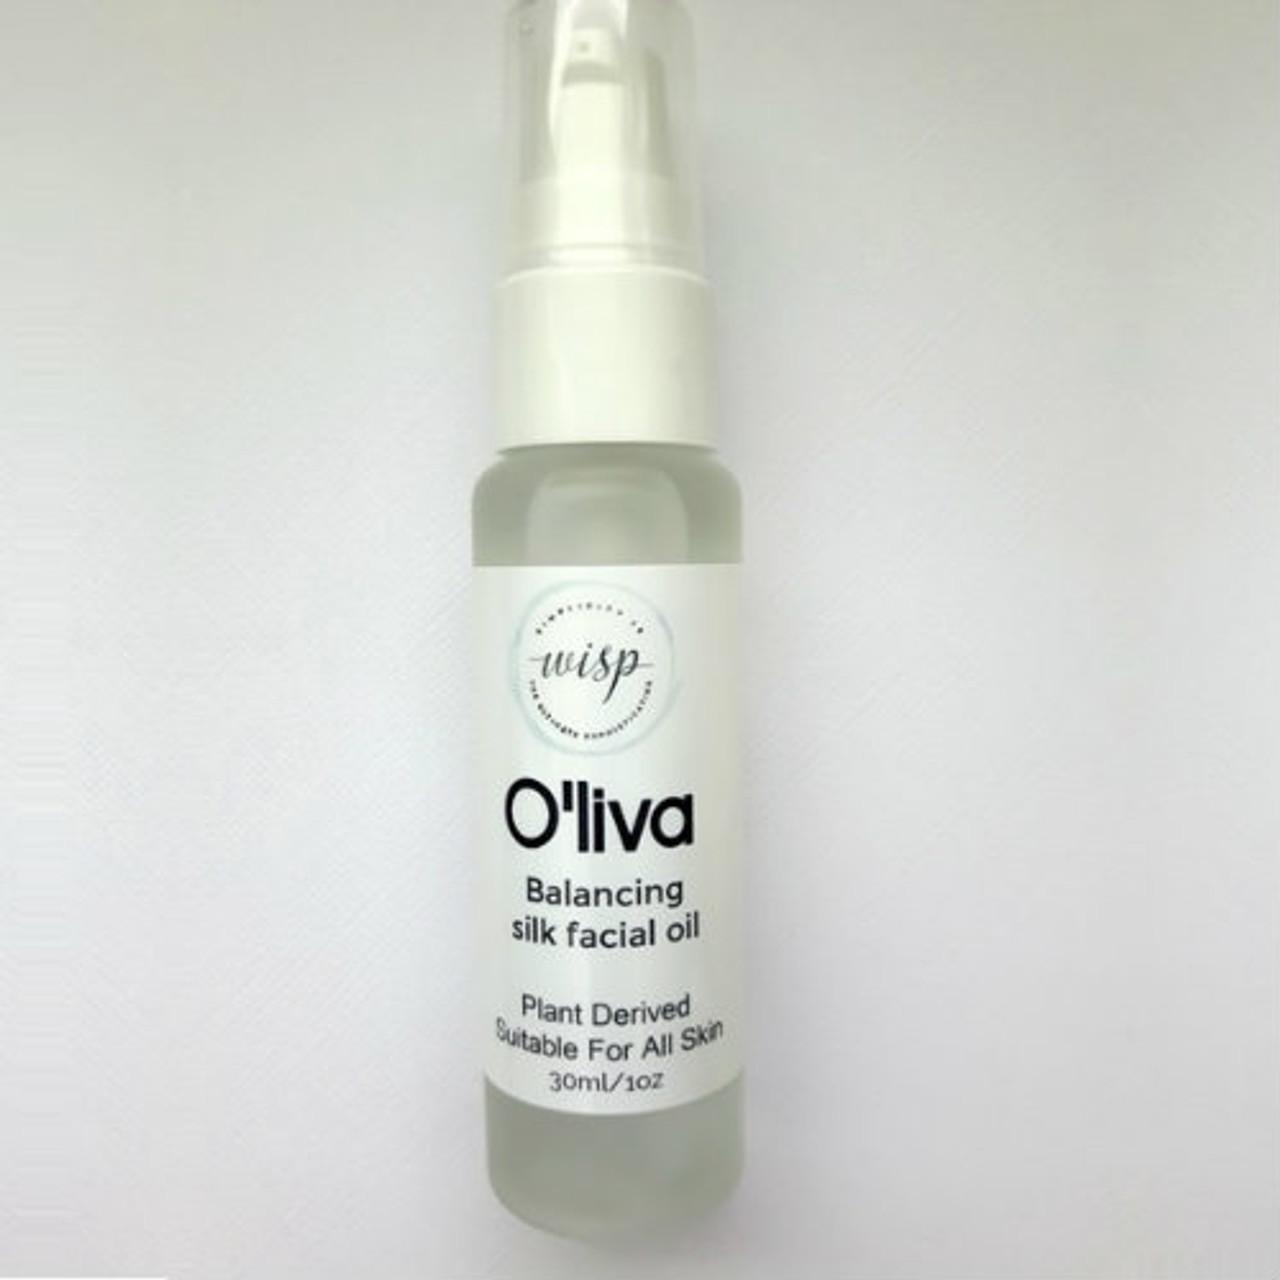 Olive-derived-pure-squalane-oil-botanical-lipid-fragrance-free-no additives-highly-moisturizing-ideal for sensitive skin